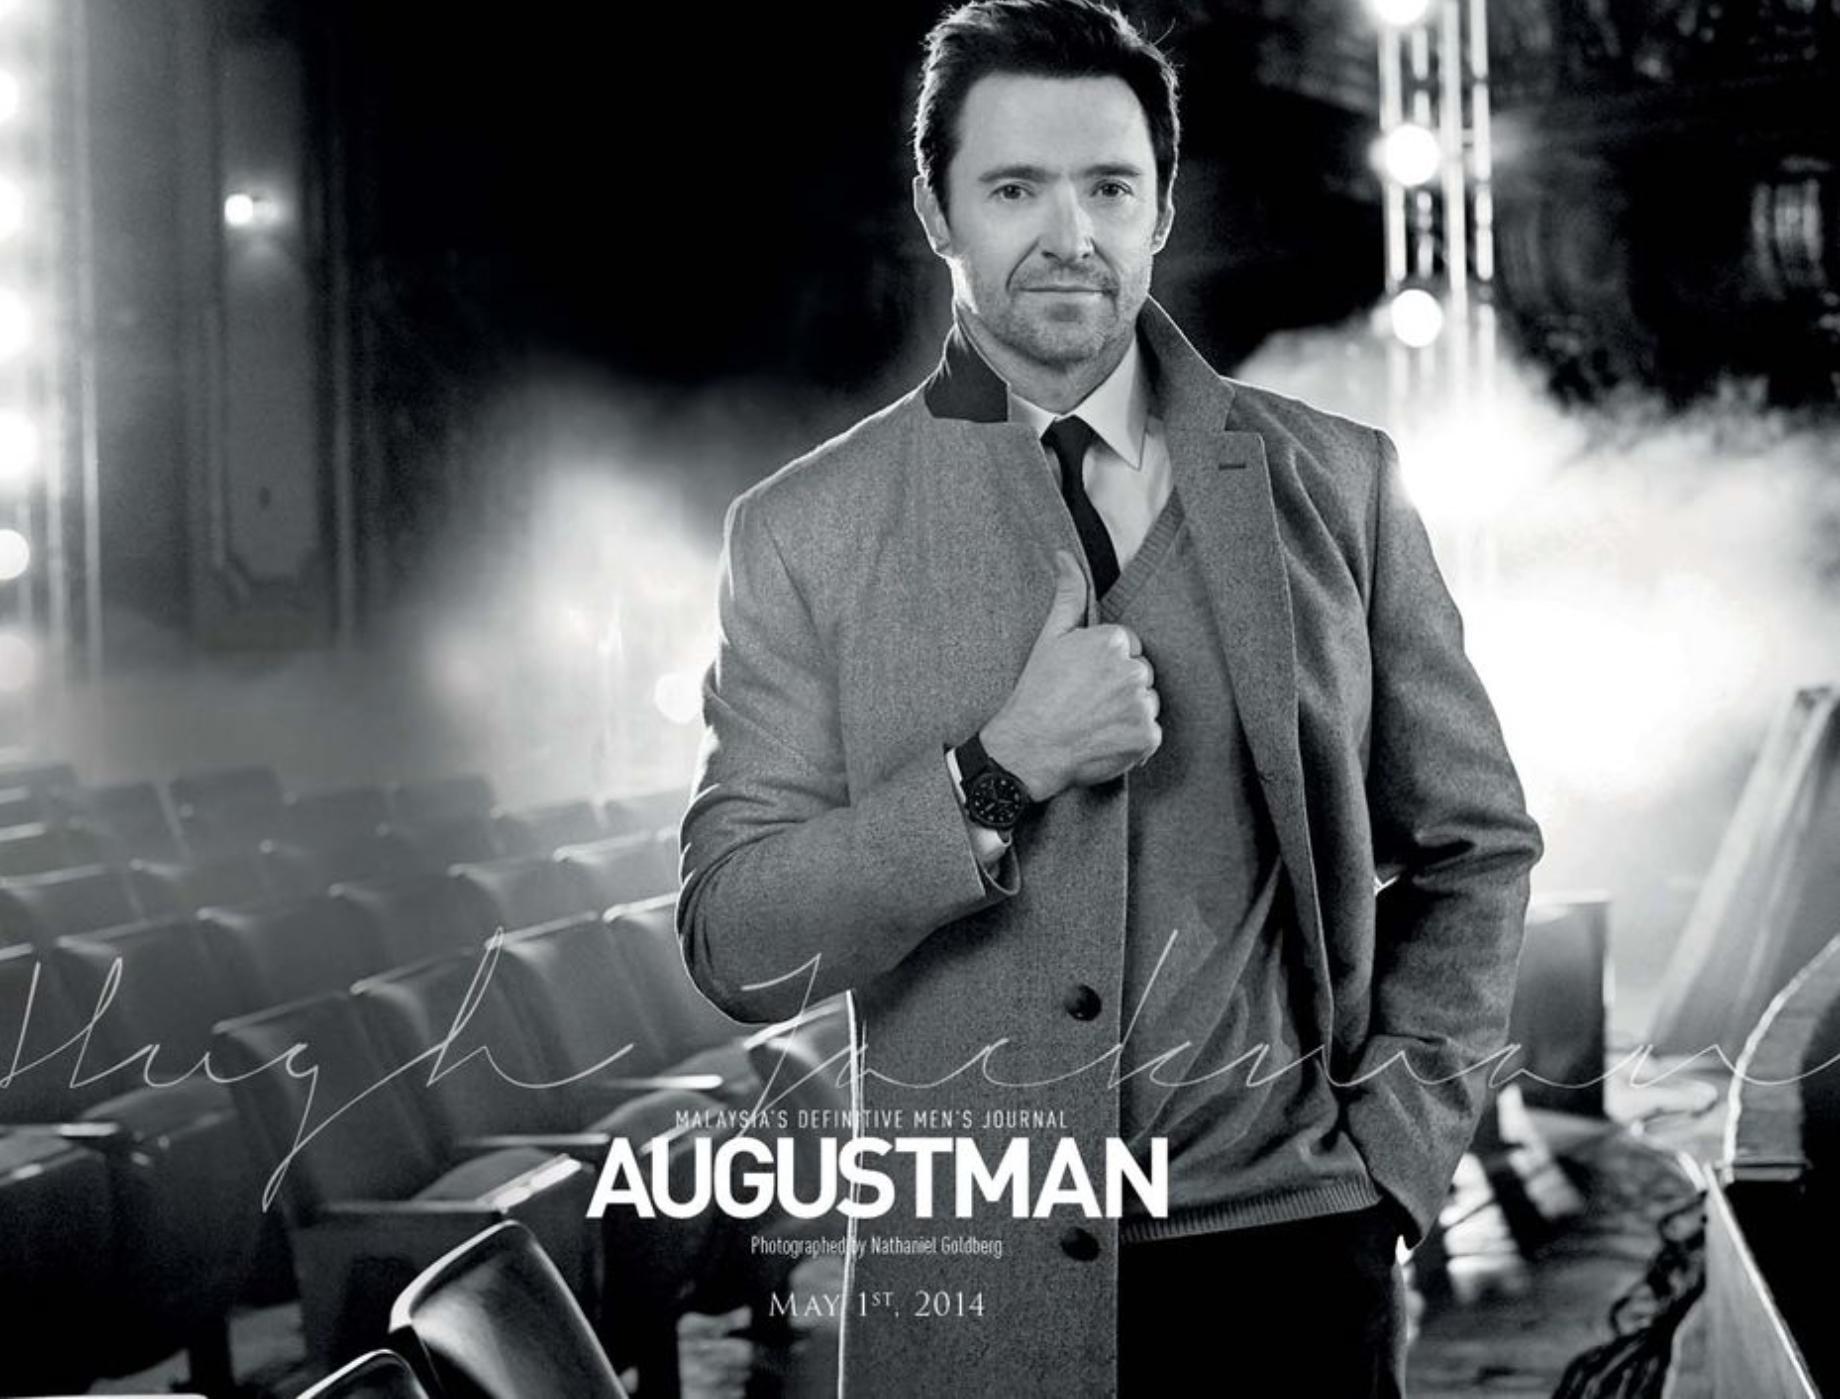 Hugh Jackman Augustman Hugh Jackman Jackman Male Magazine